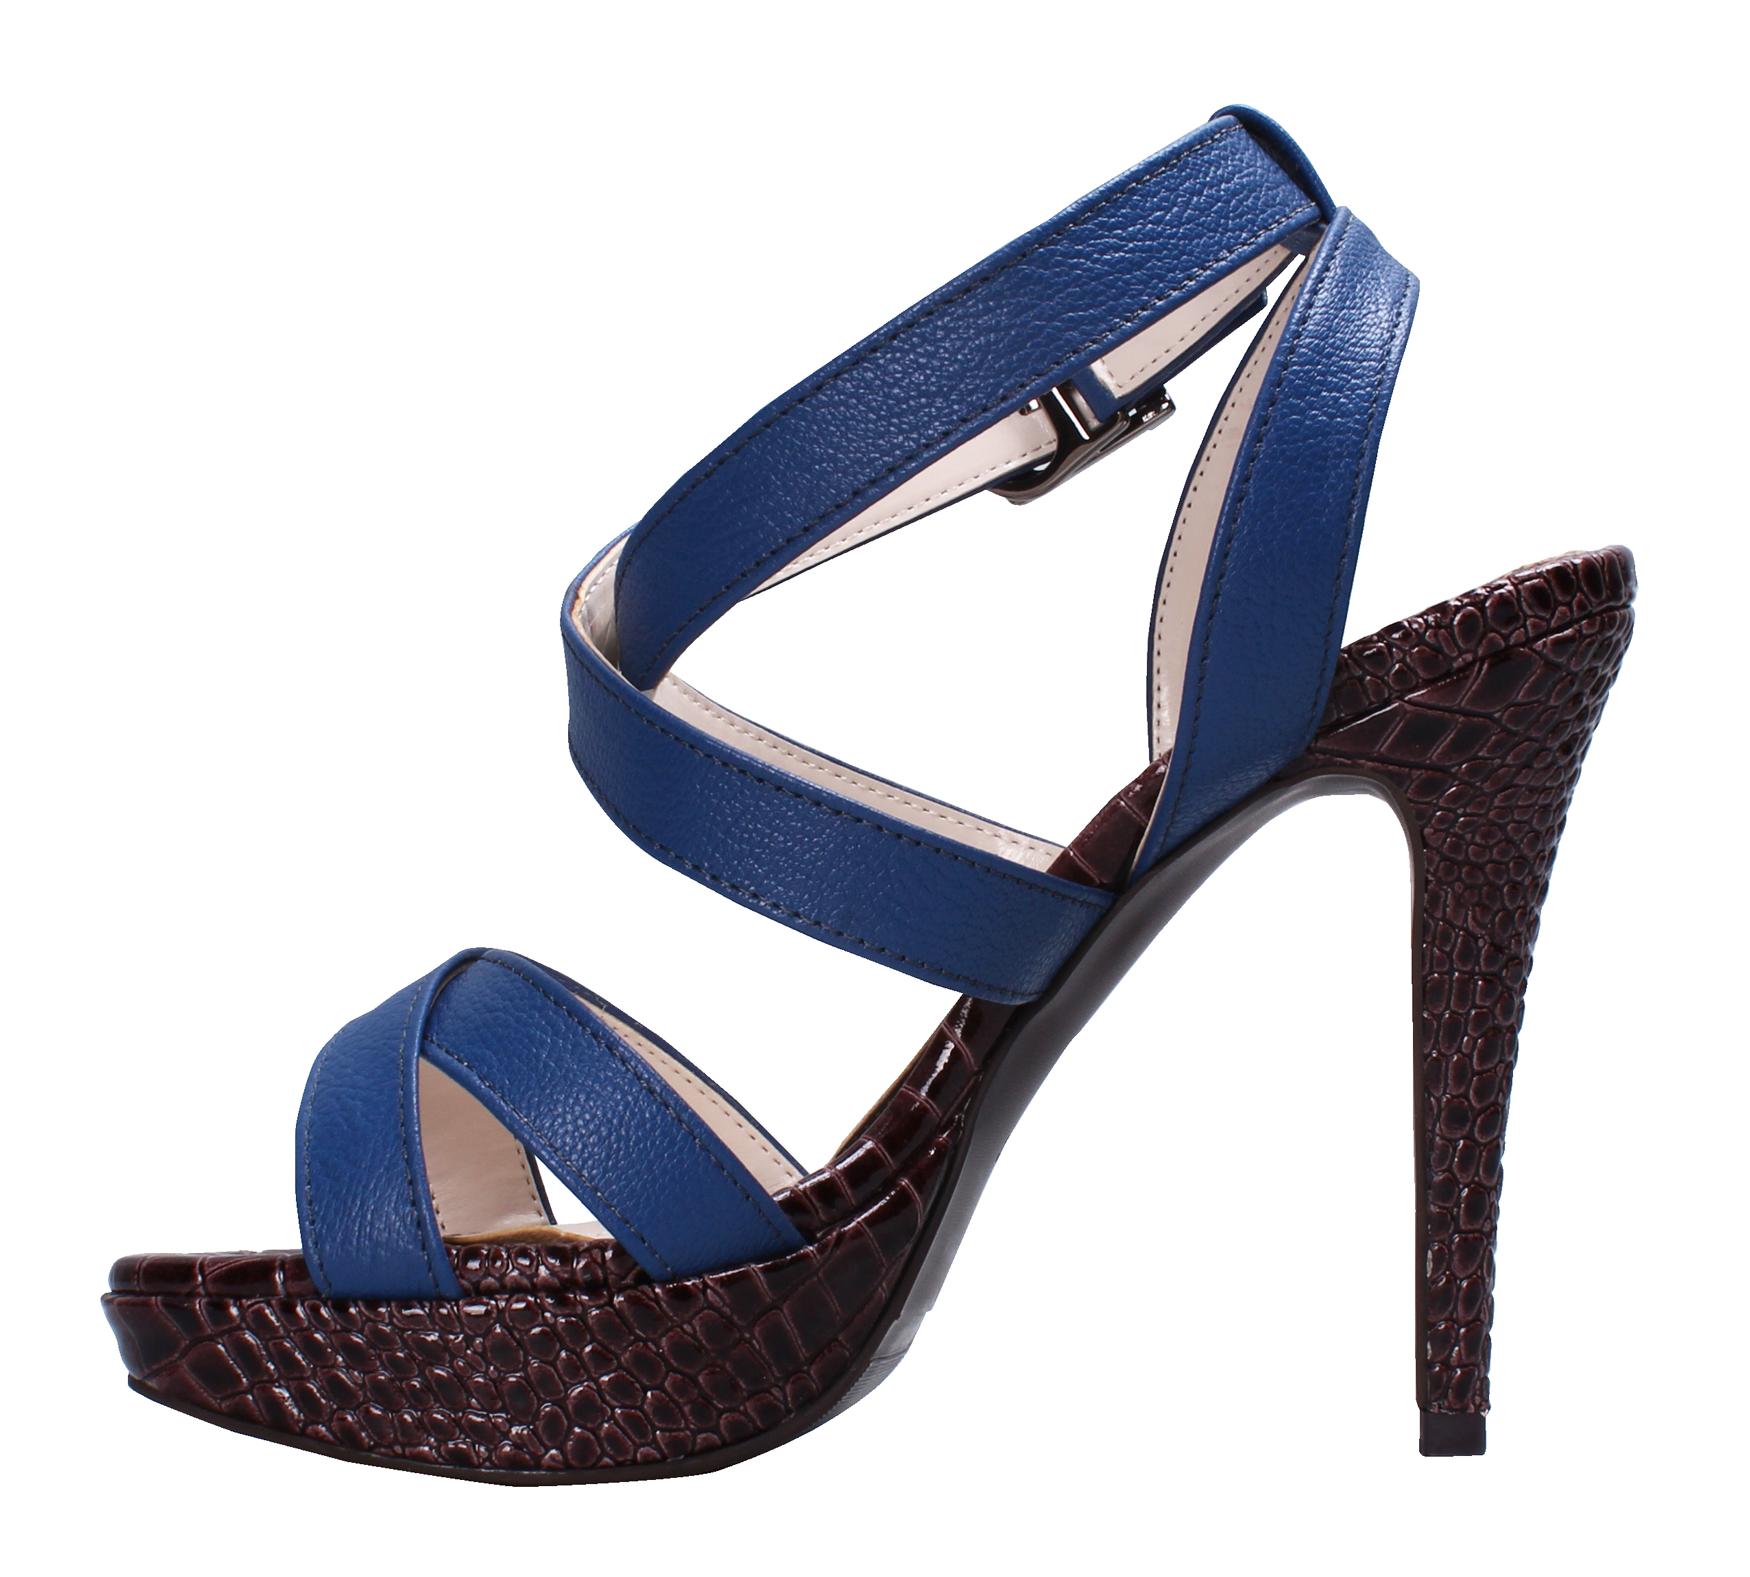 Sandals HD PNG - 118868